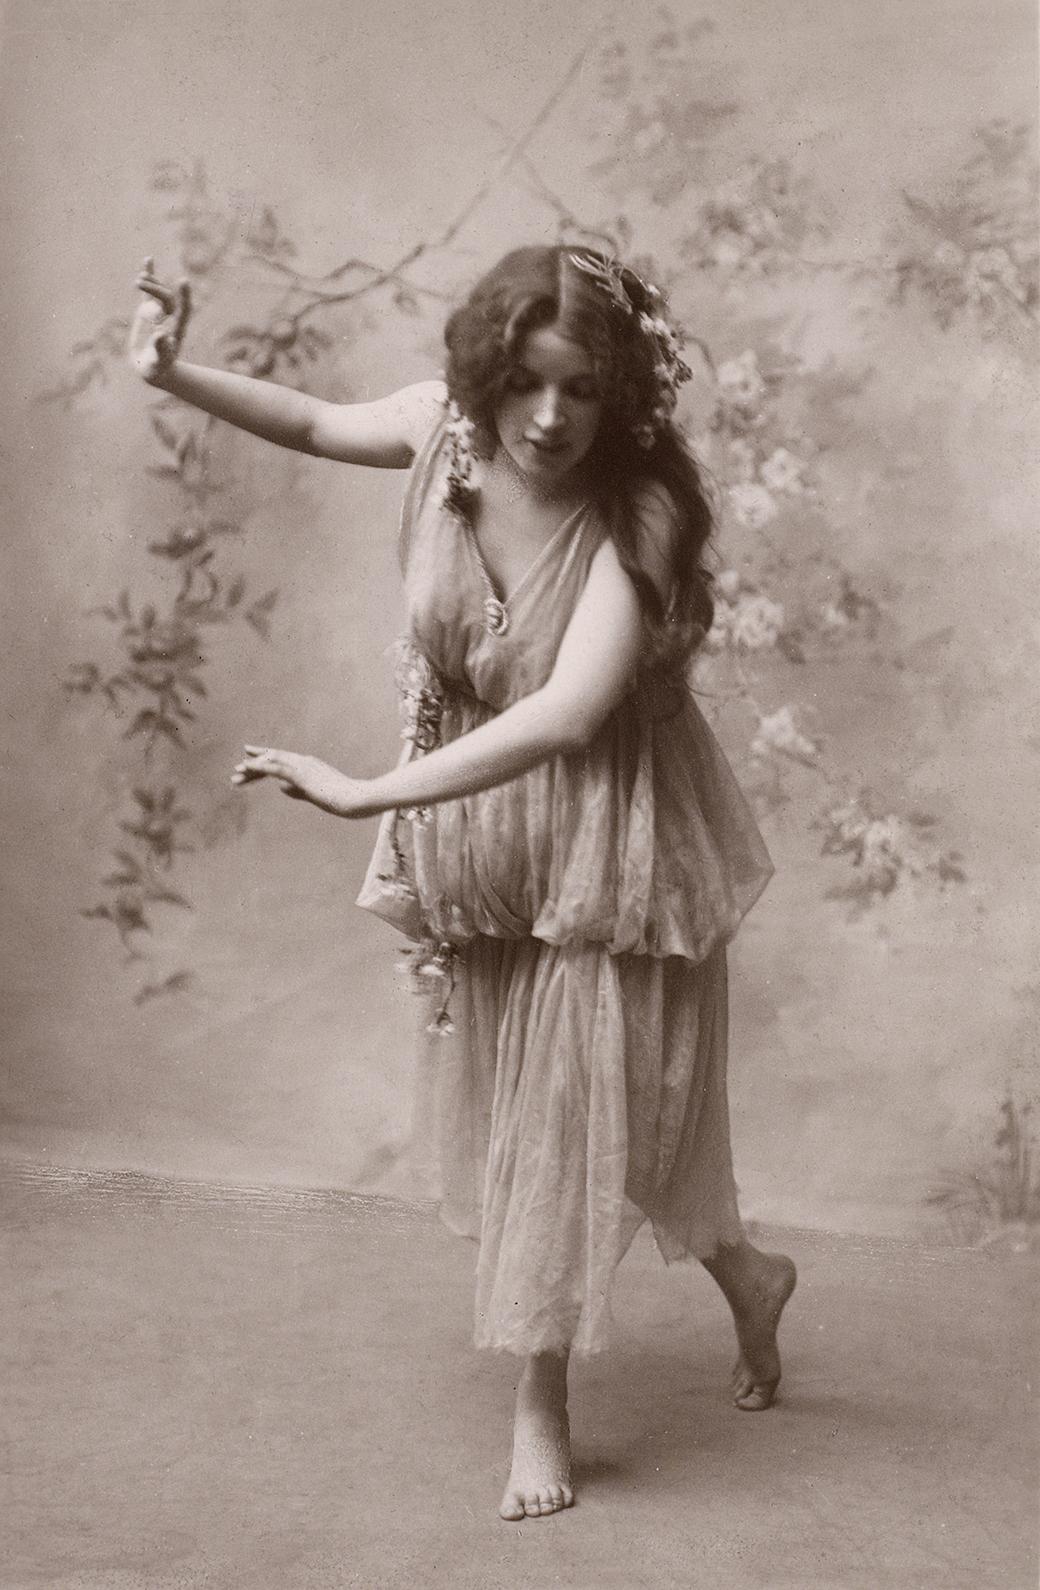 Vintage Bohemian Lady Image